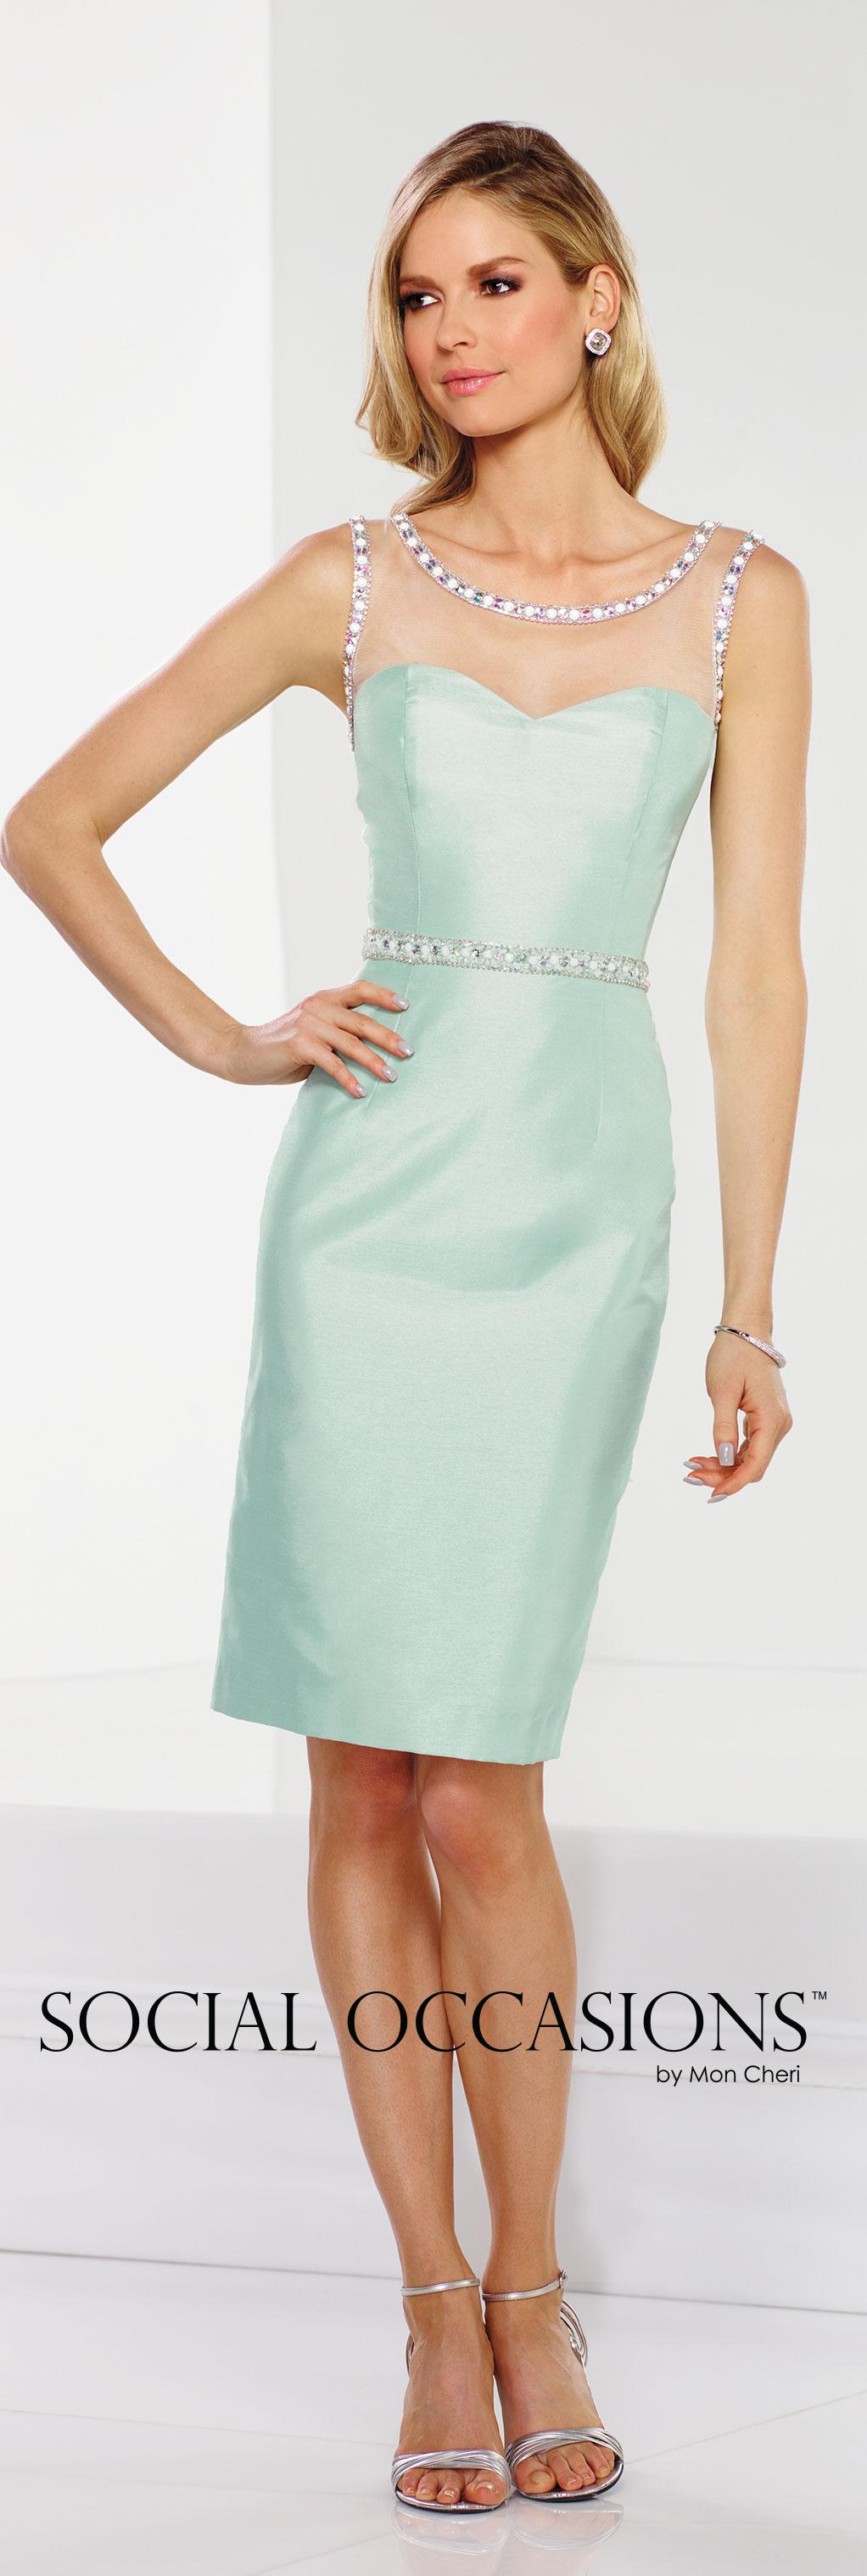 Elite wedding dresses  Wedding Guest Dresses   Evening Dresses  Pinterest  Spring